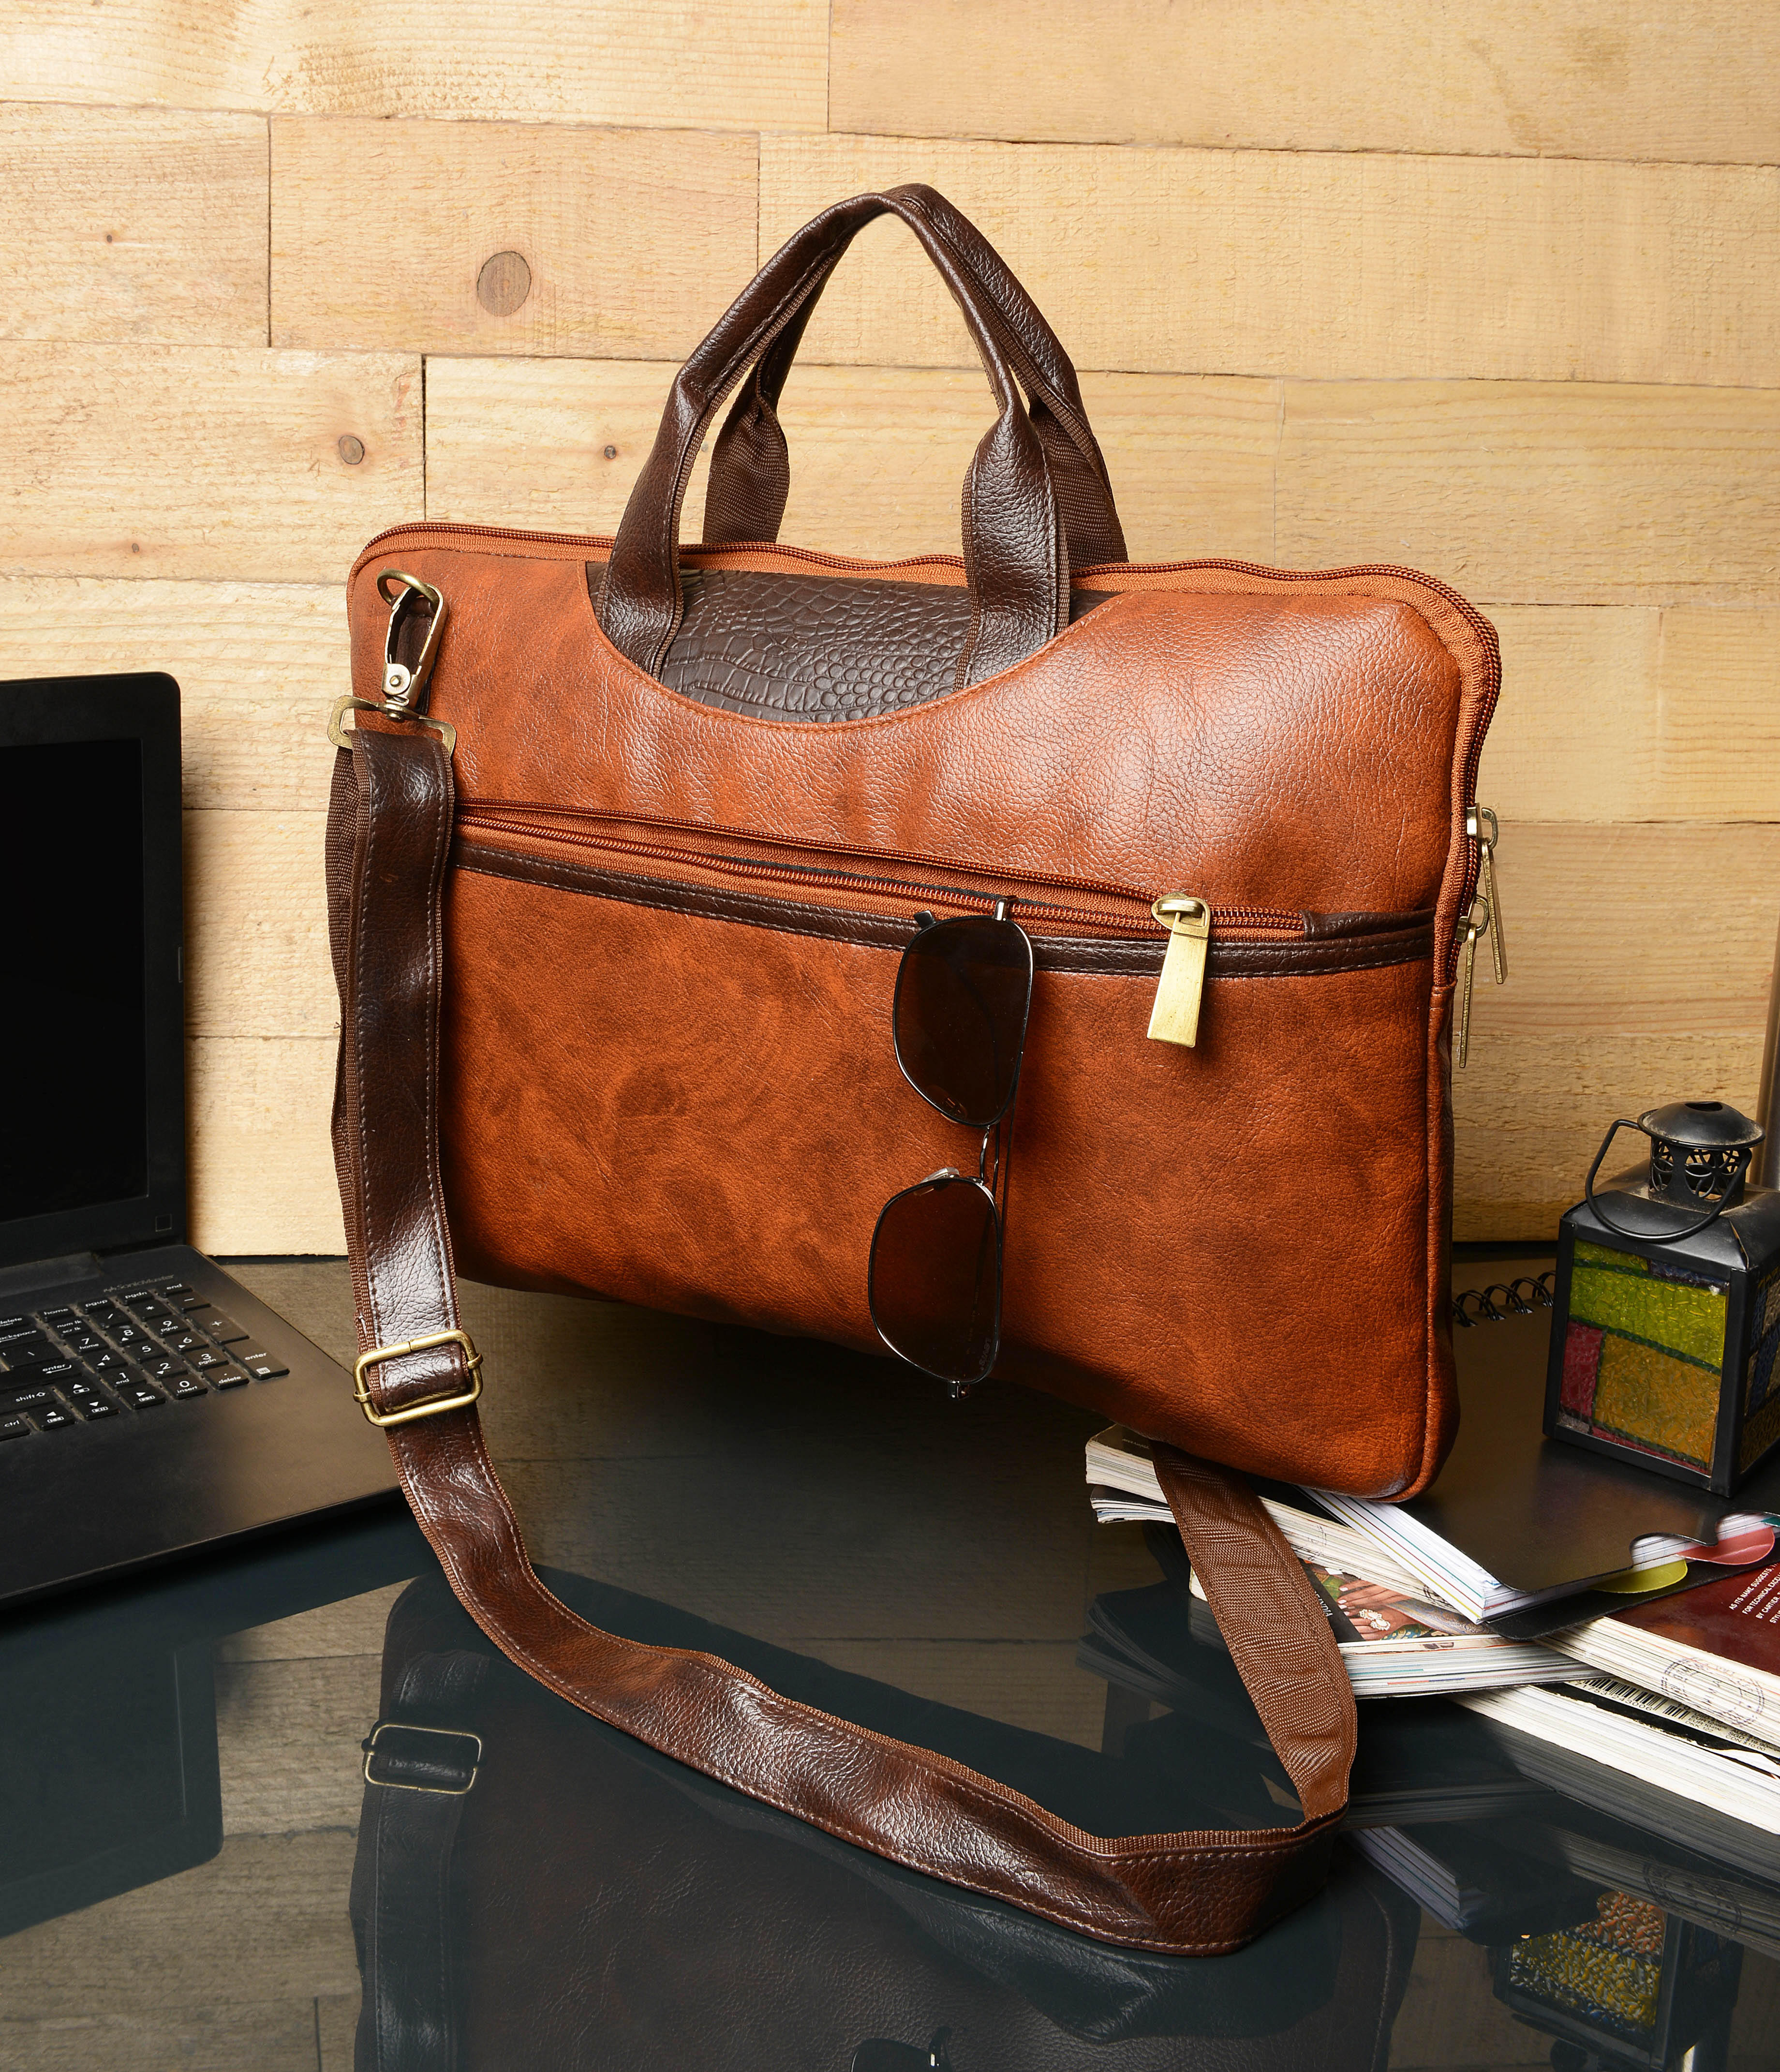 Vivinkaa | Vivinkaa Faux Leather 15.6 inch Contrast Tan Padded Laptop Messenger bag for Men & Women